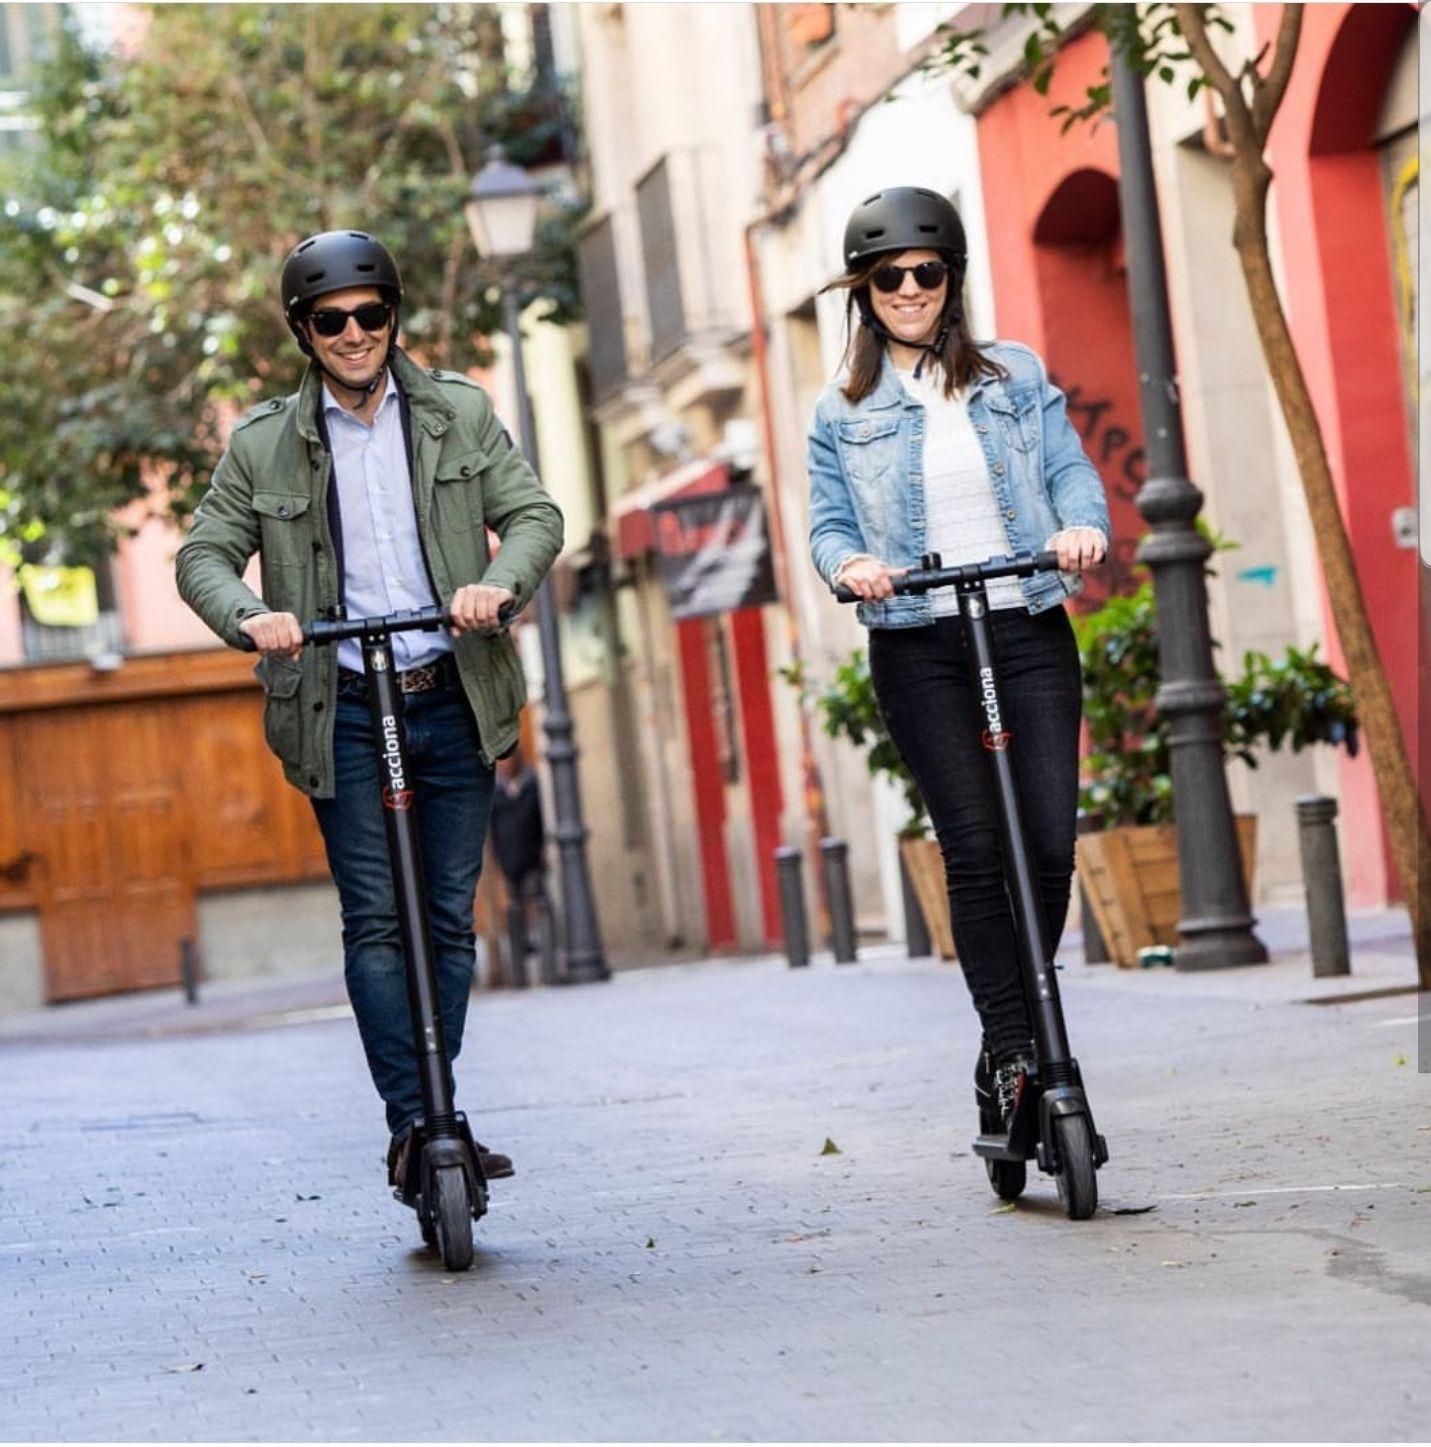 Patinetes acciona mobility gratis este fin de semana en Madrid